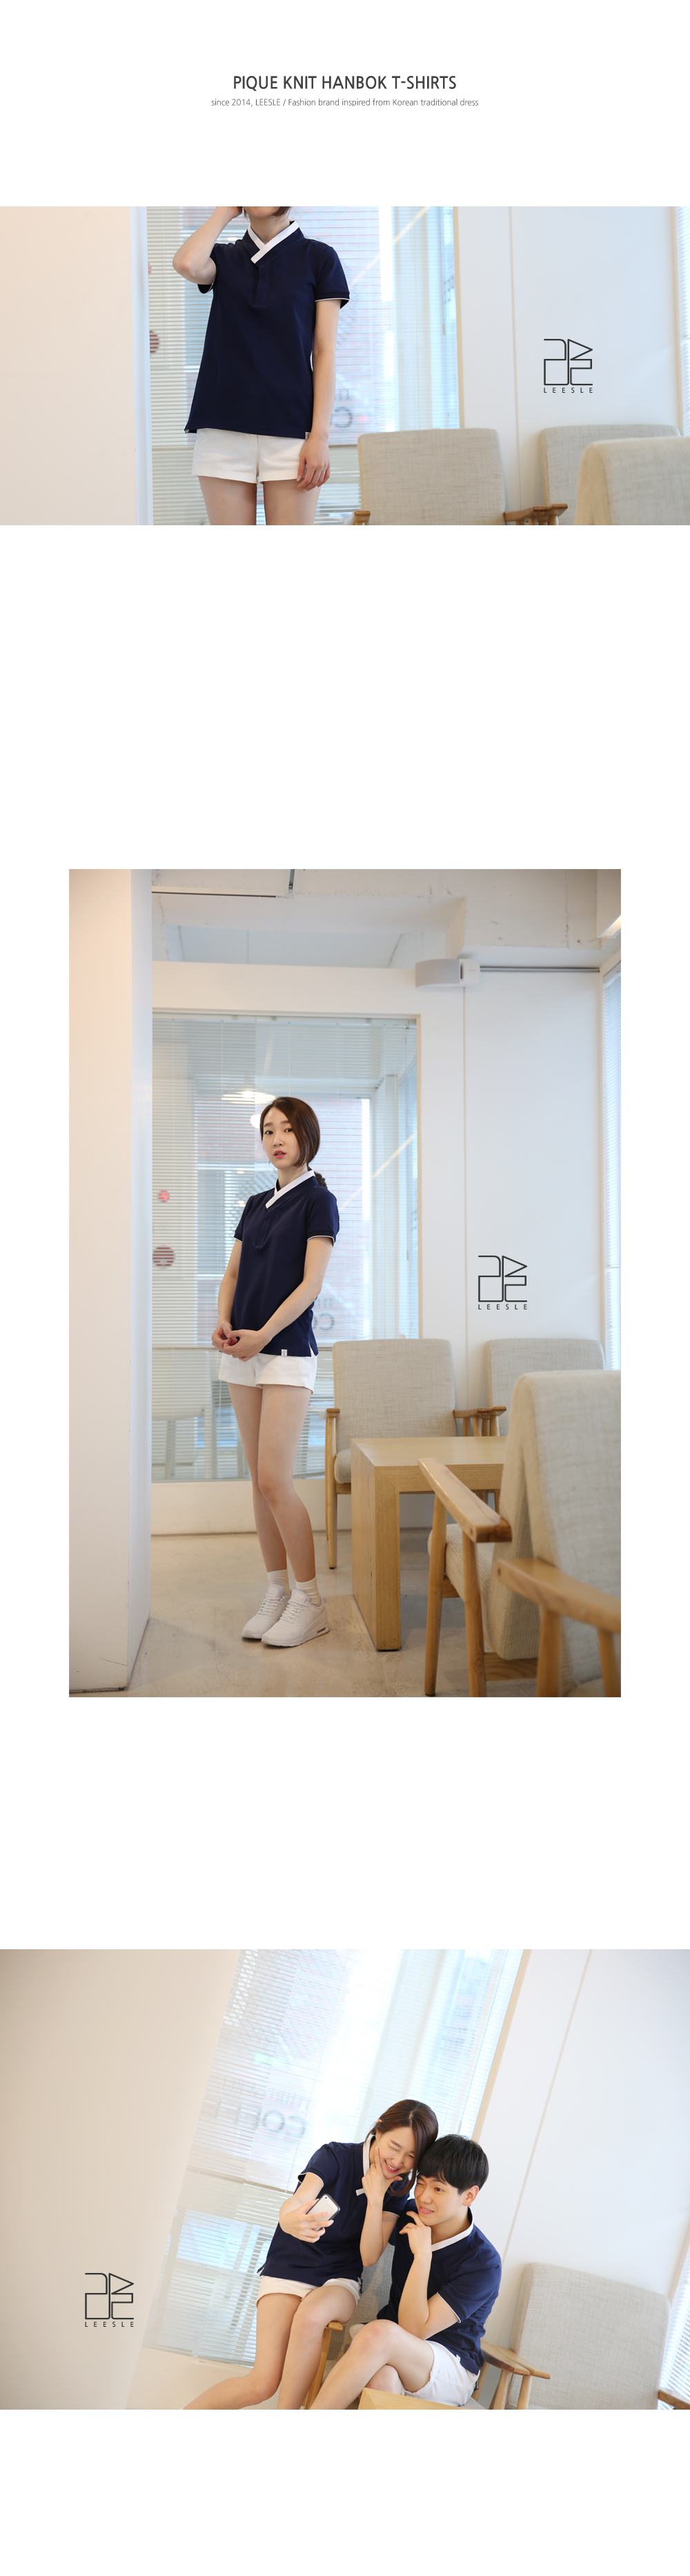 [ leesle ] PK 女式韩服的 T 恤衫-[海军]